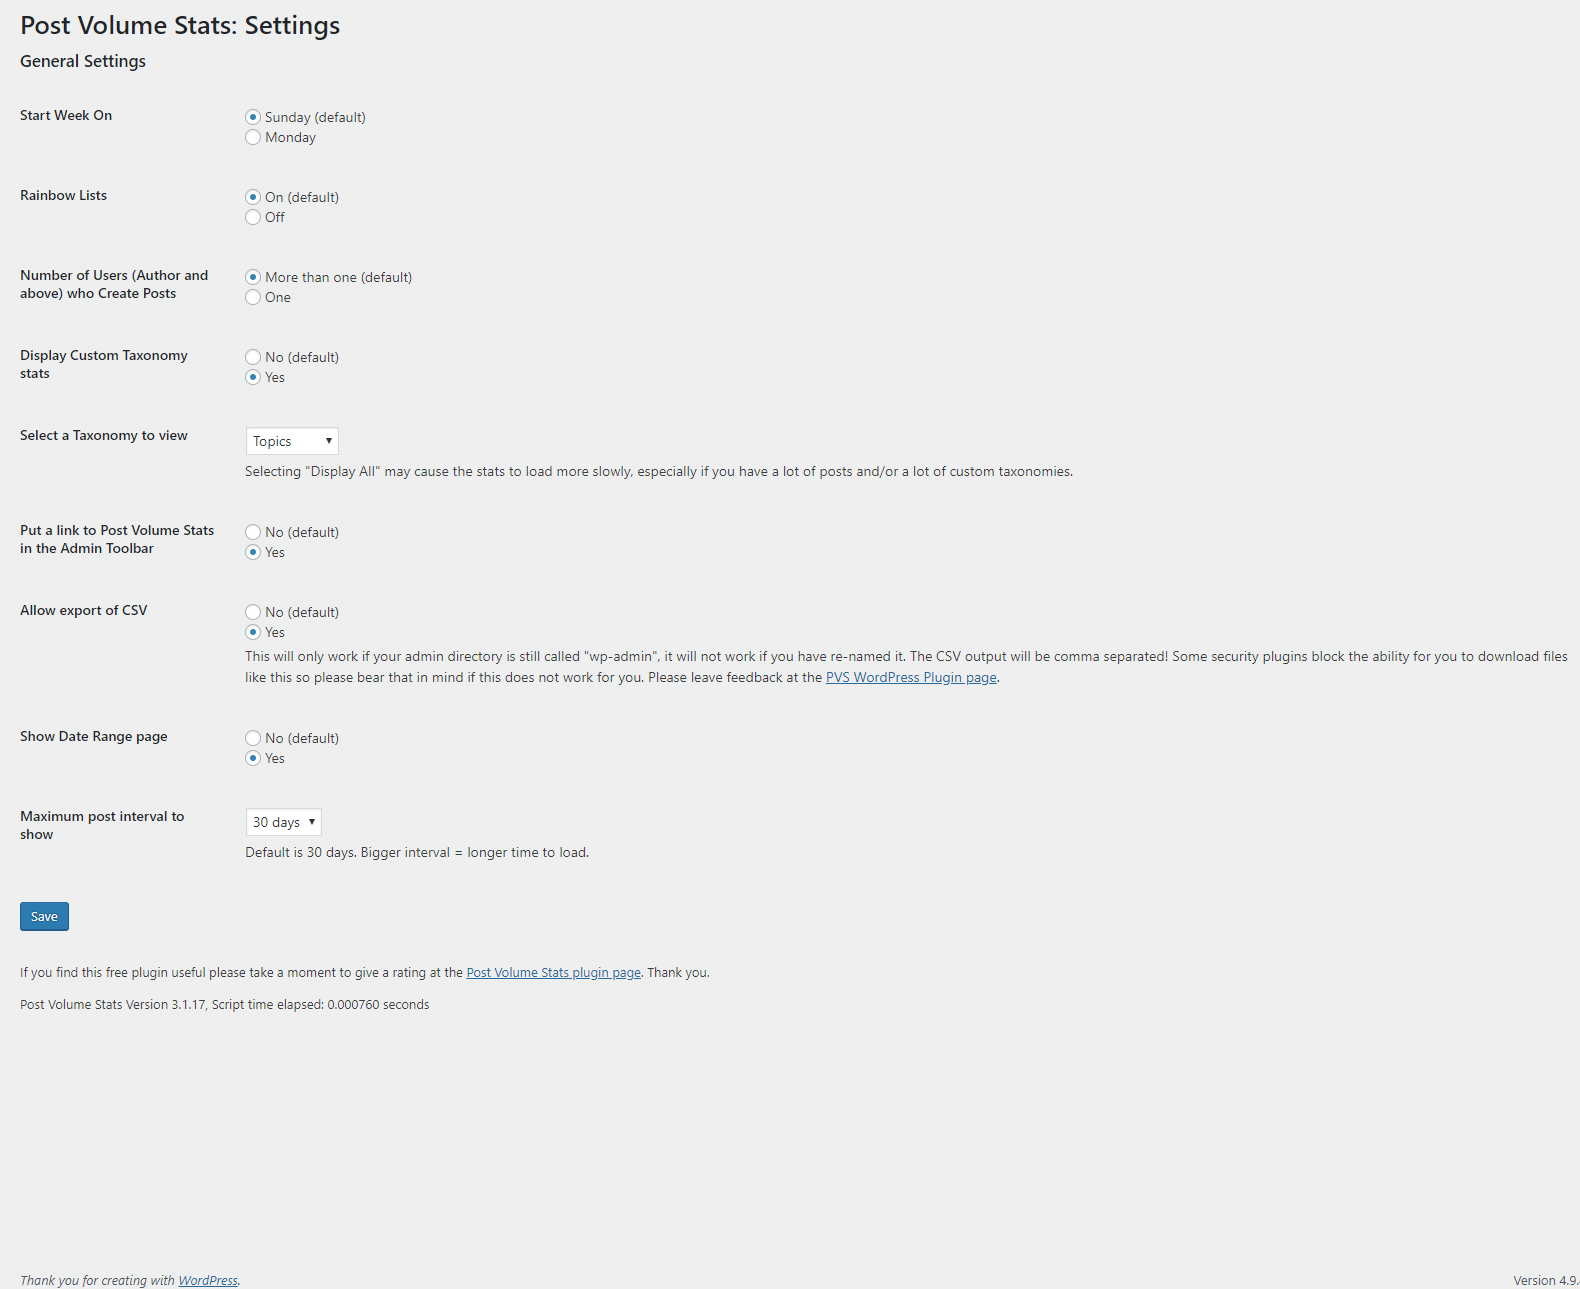 New settings page screenshot